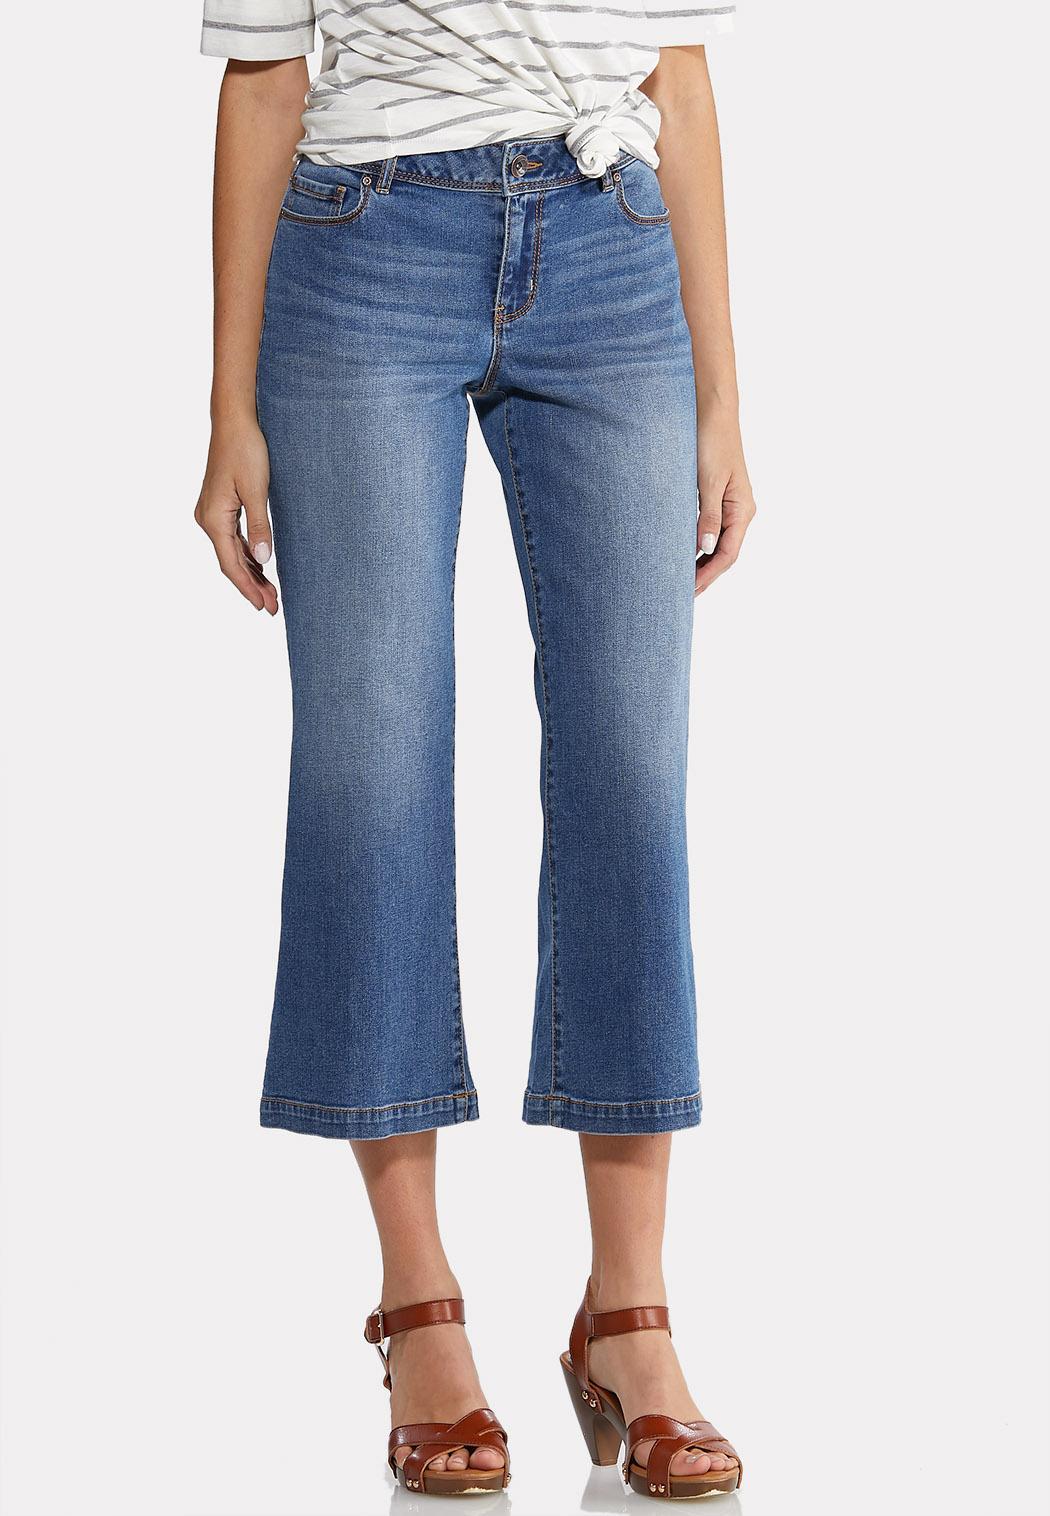 Petite Wide Leg Cropped Jeans